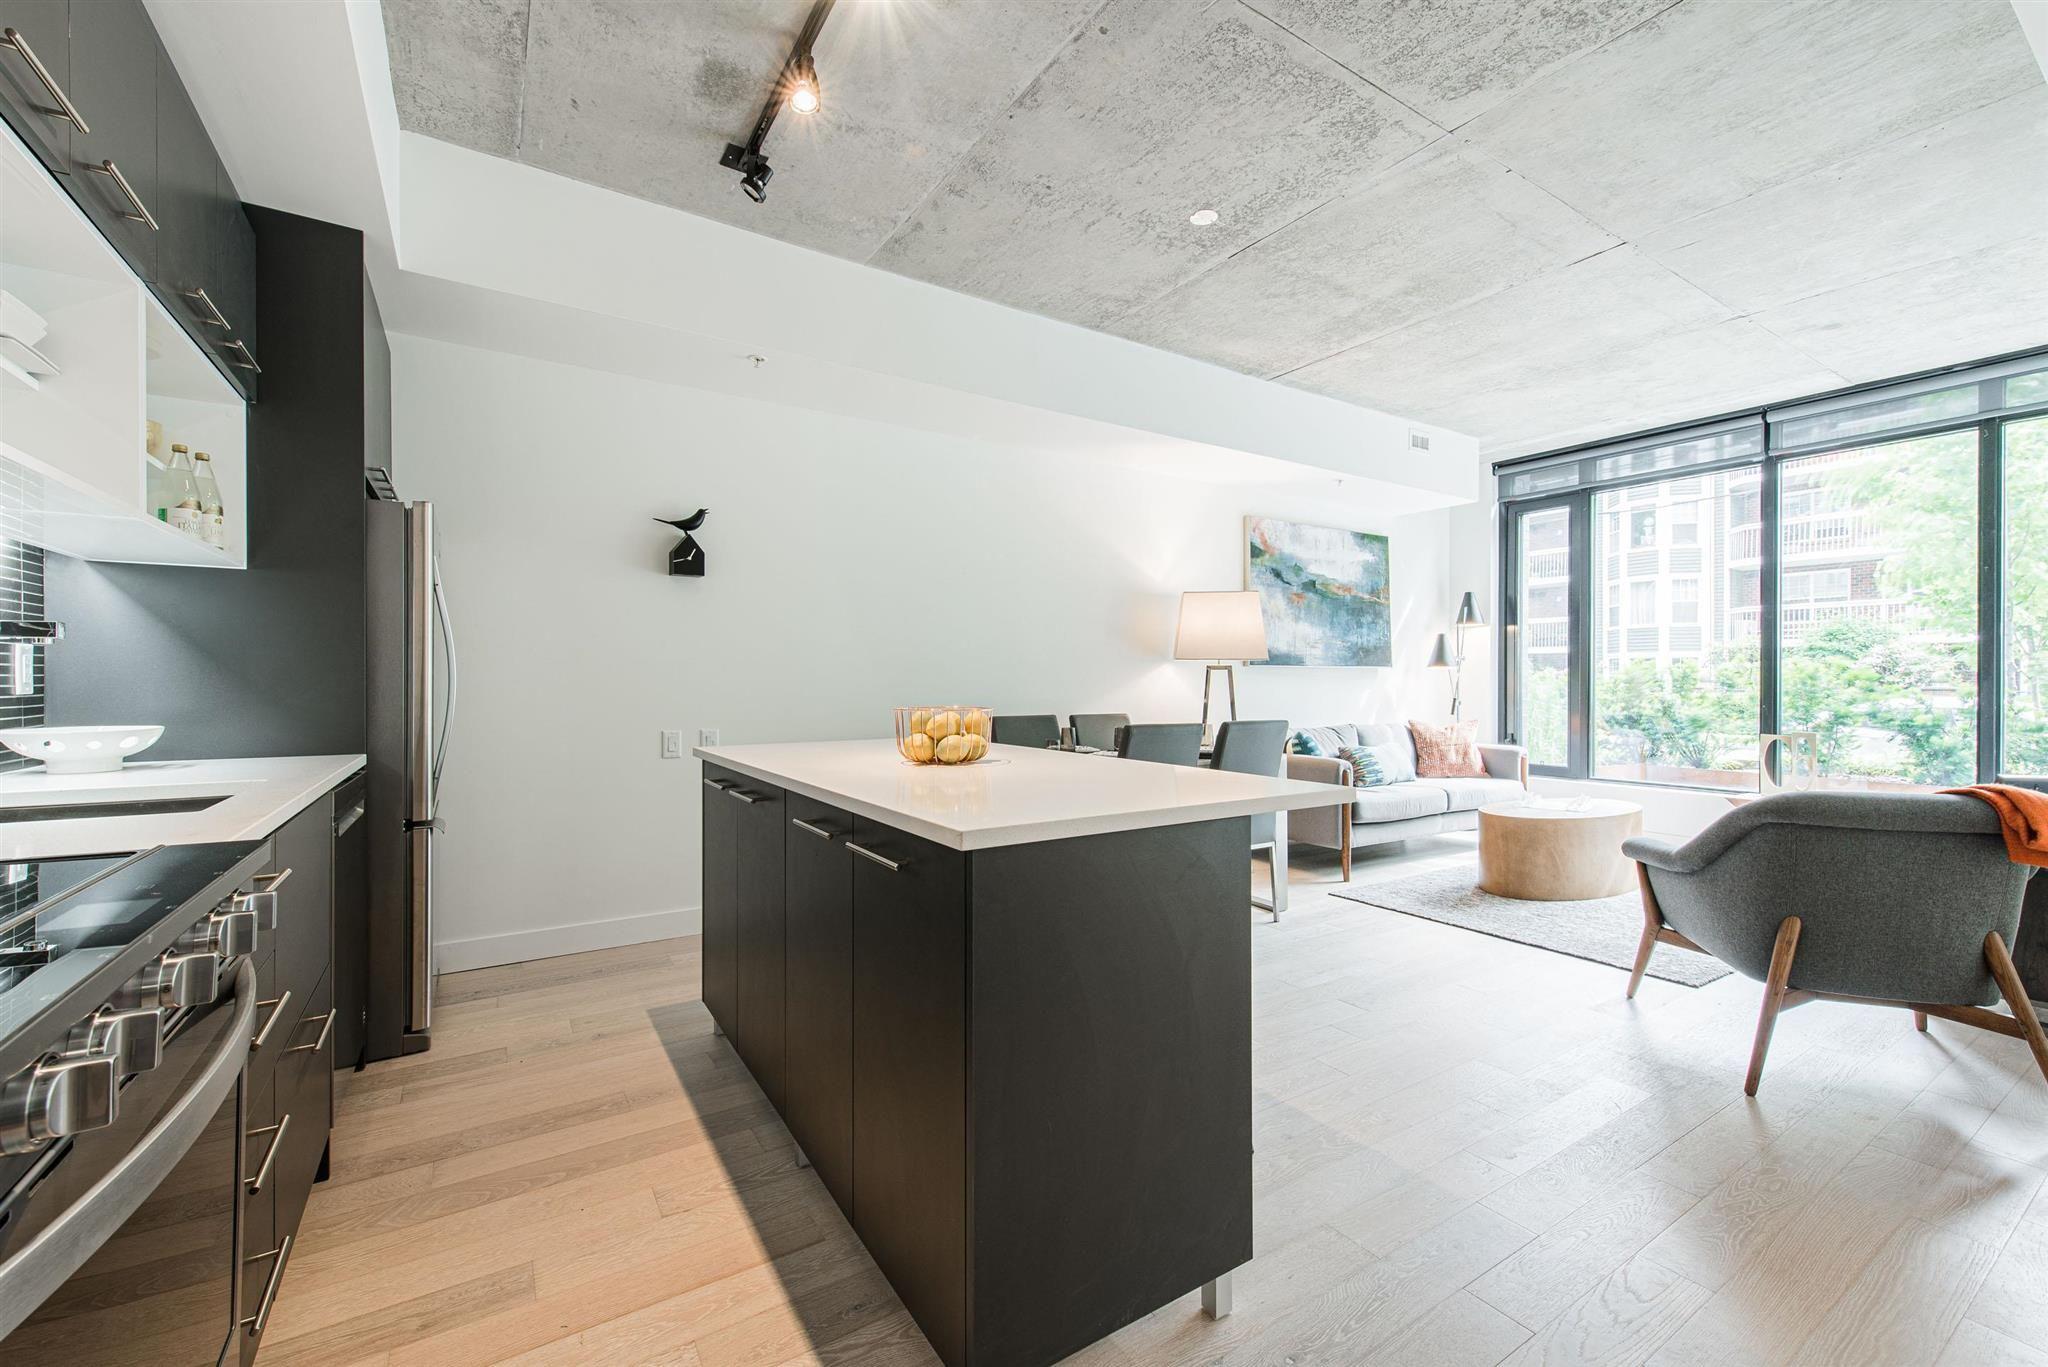 Photo 12: Photos: 105 1048 Wellington Street in Halifax: 2-Halifax South Residential for sale (Halifax-Dartmouth)  : MLS®# 202100816